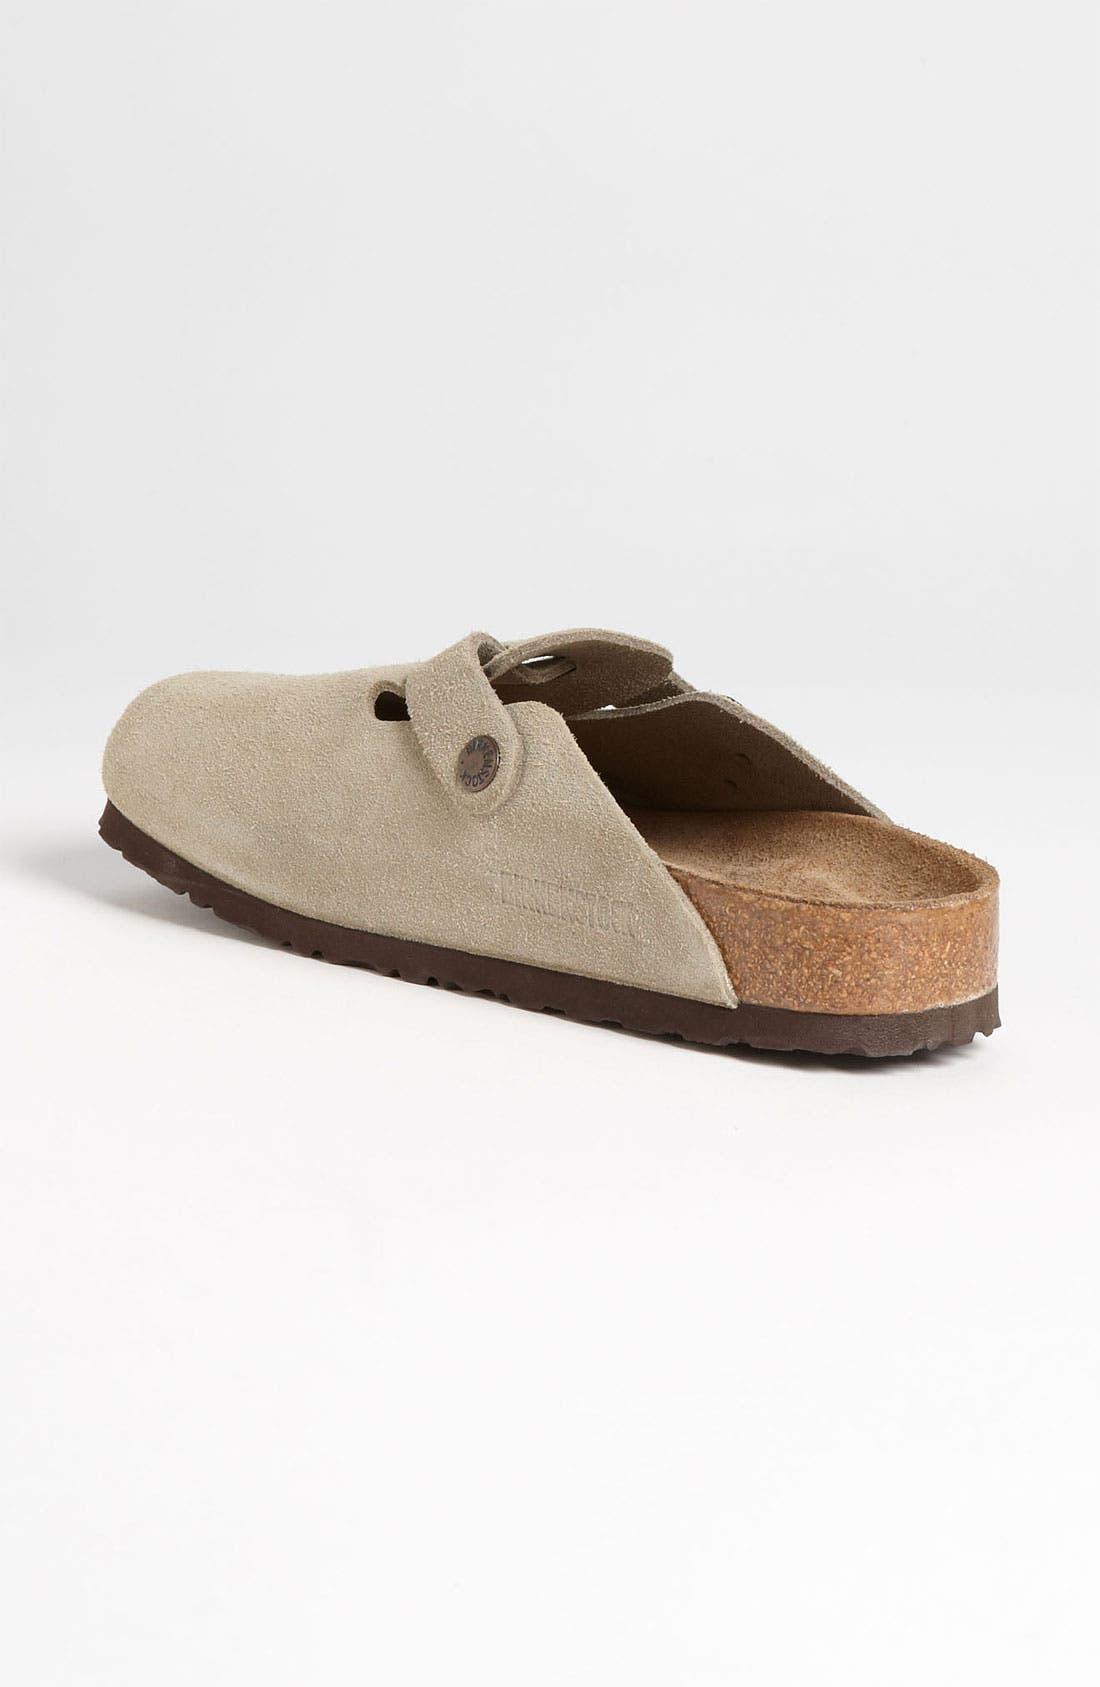 Alternate Image 2  - Birkenstock 'Boston' Soft Footbed Clog (Women)